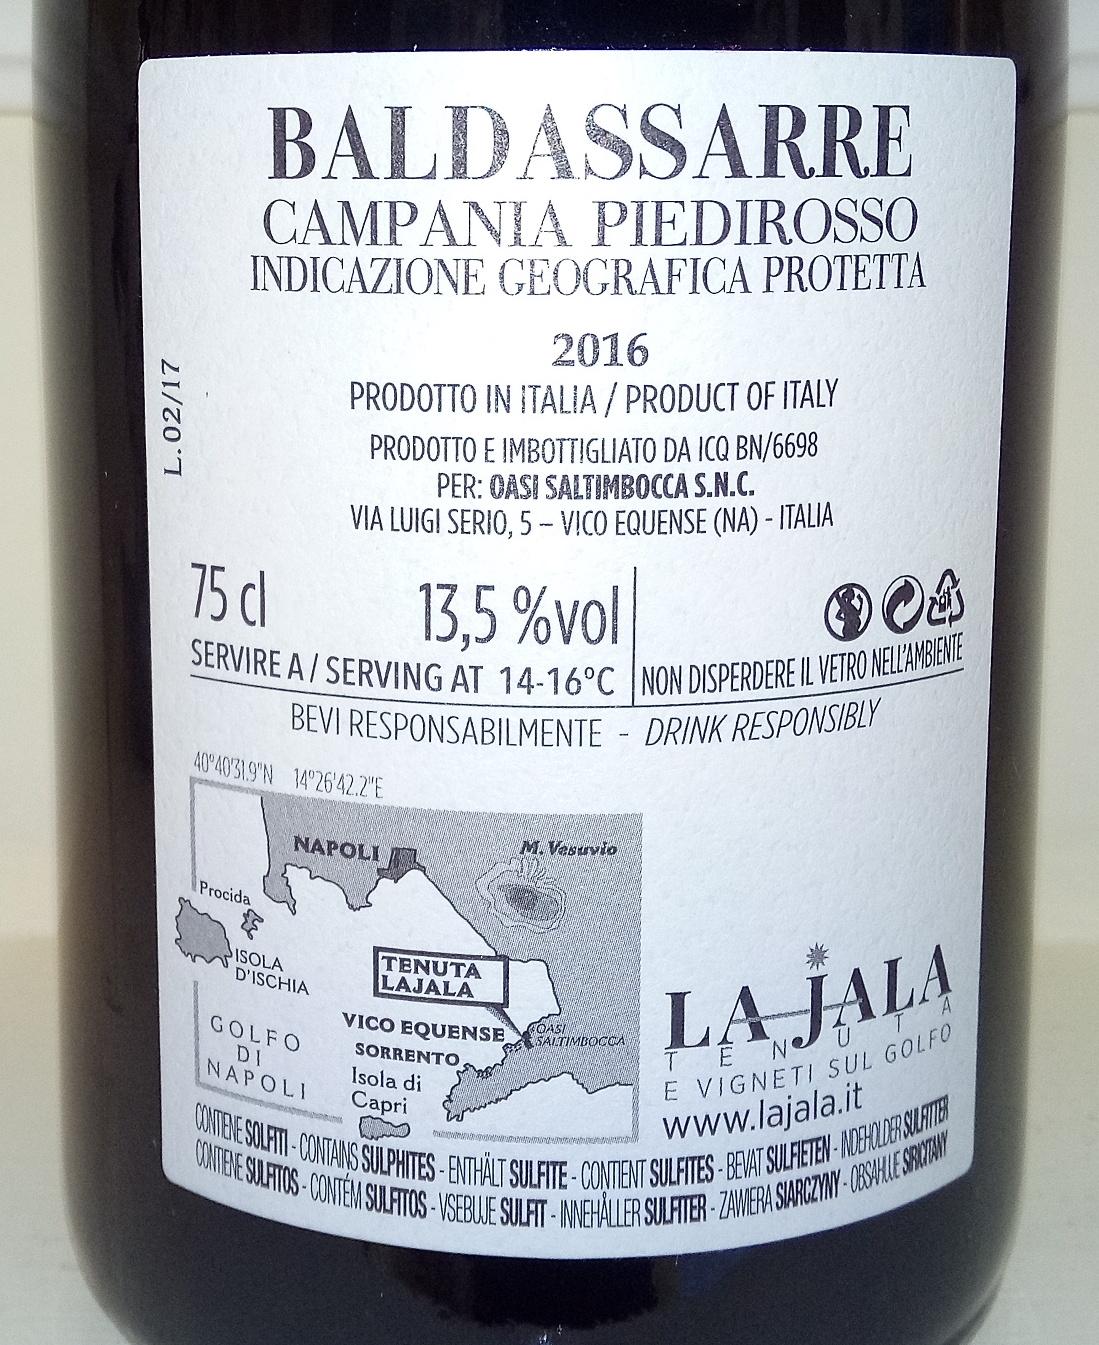 Controetichetta Baldassarre Campania Piedirosso Igp 2016 La Jala